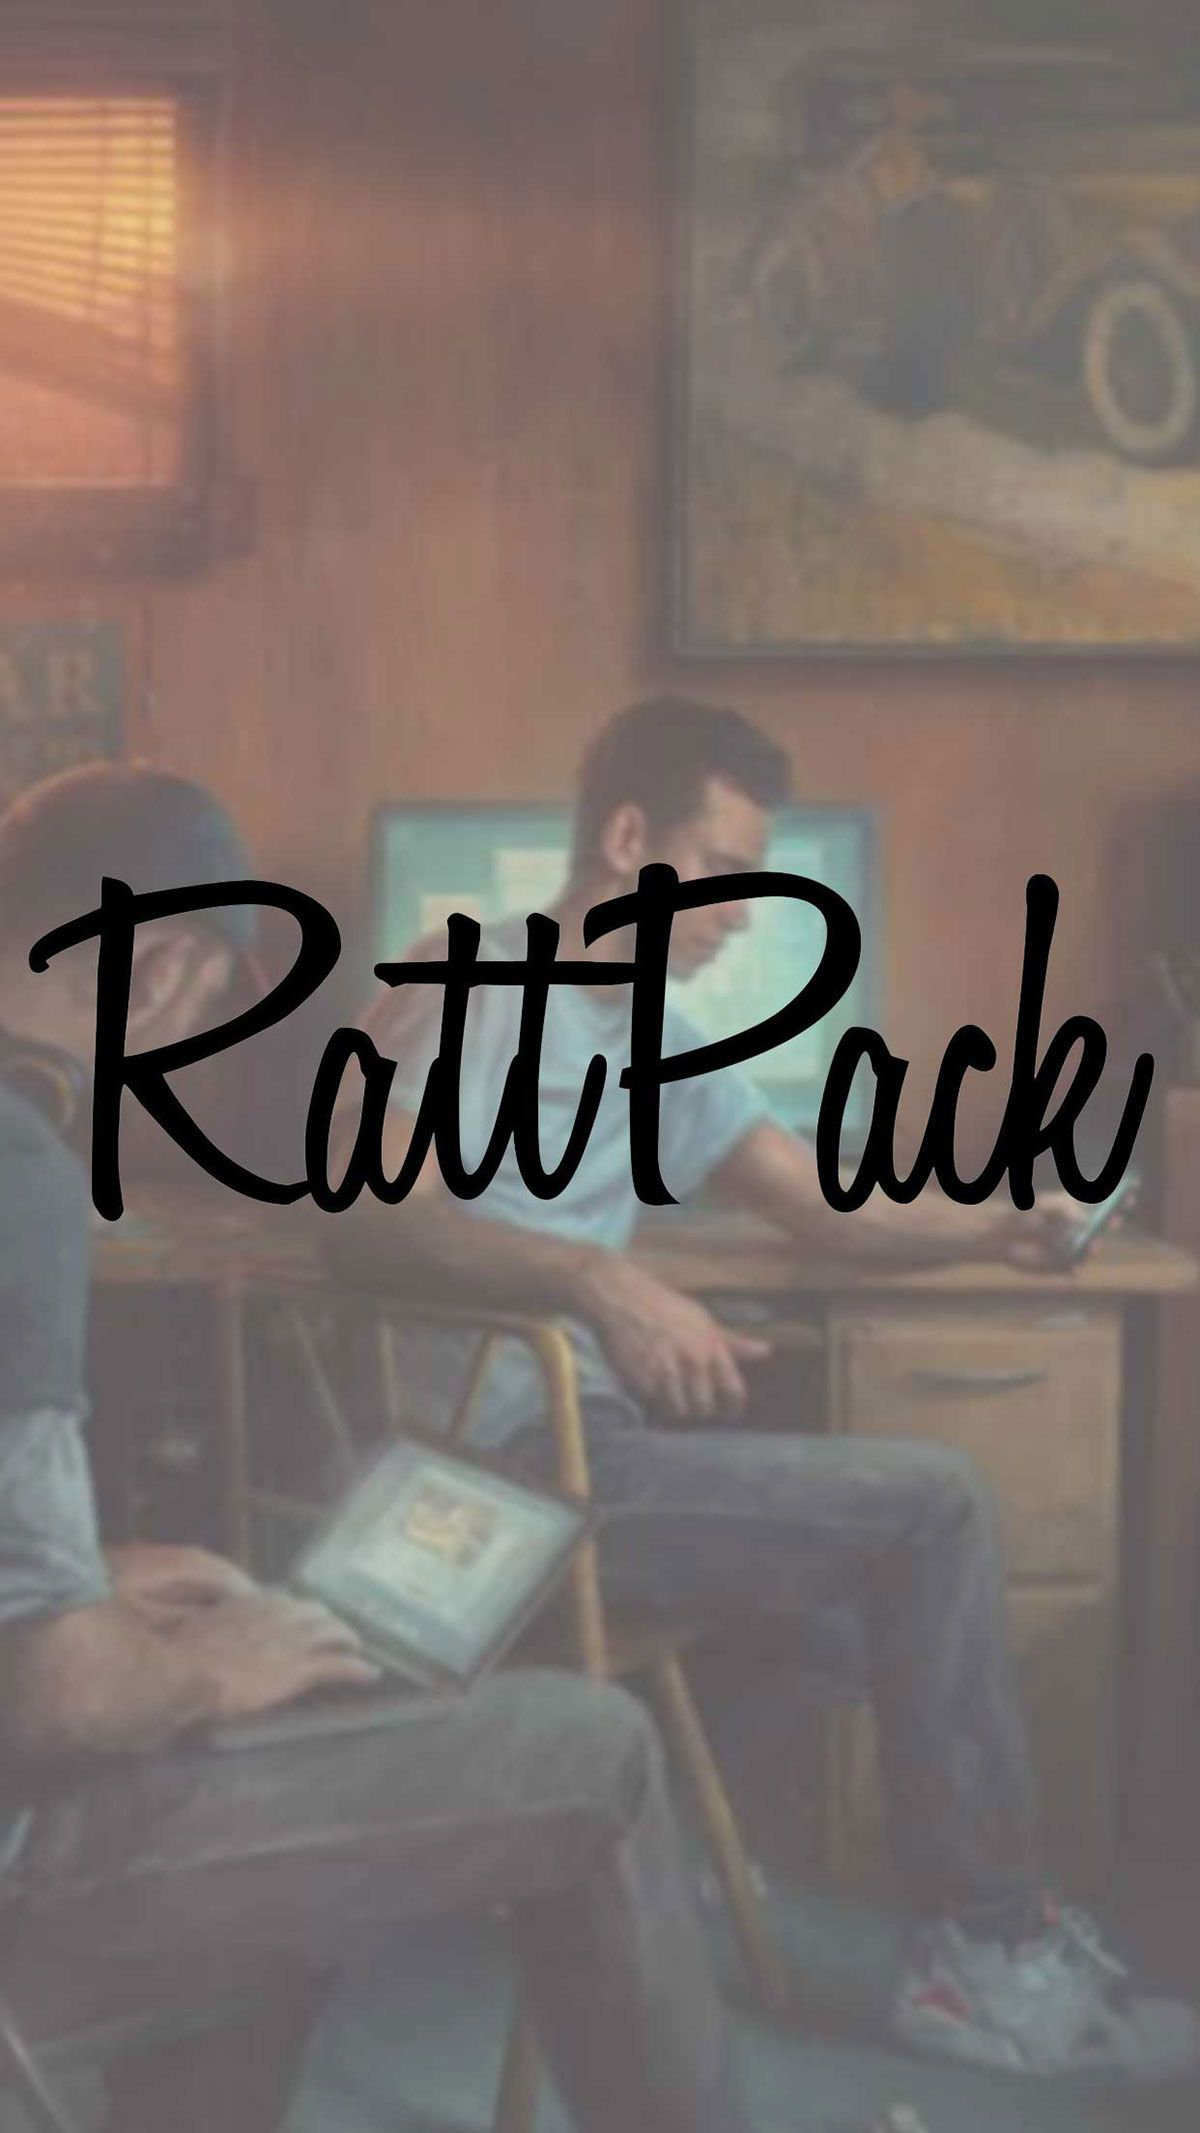 Rattpack Iphone 6 Plus Wallpaper Underpressure Logic On Behance Logic Rapper Quotes Logic Rapper Wallpaper Logic Lyrics